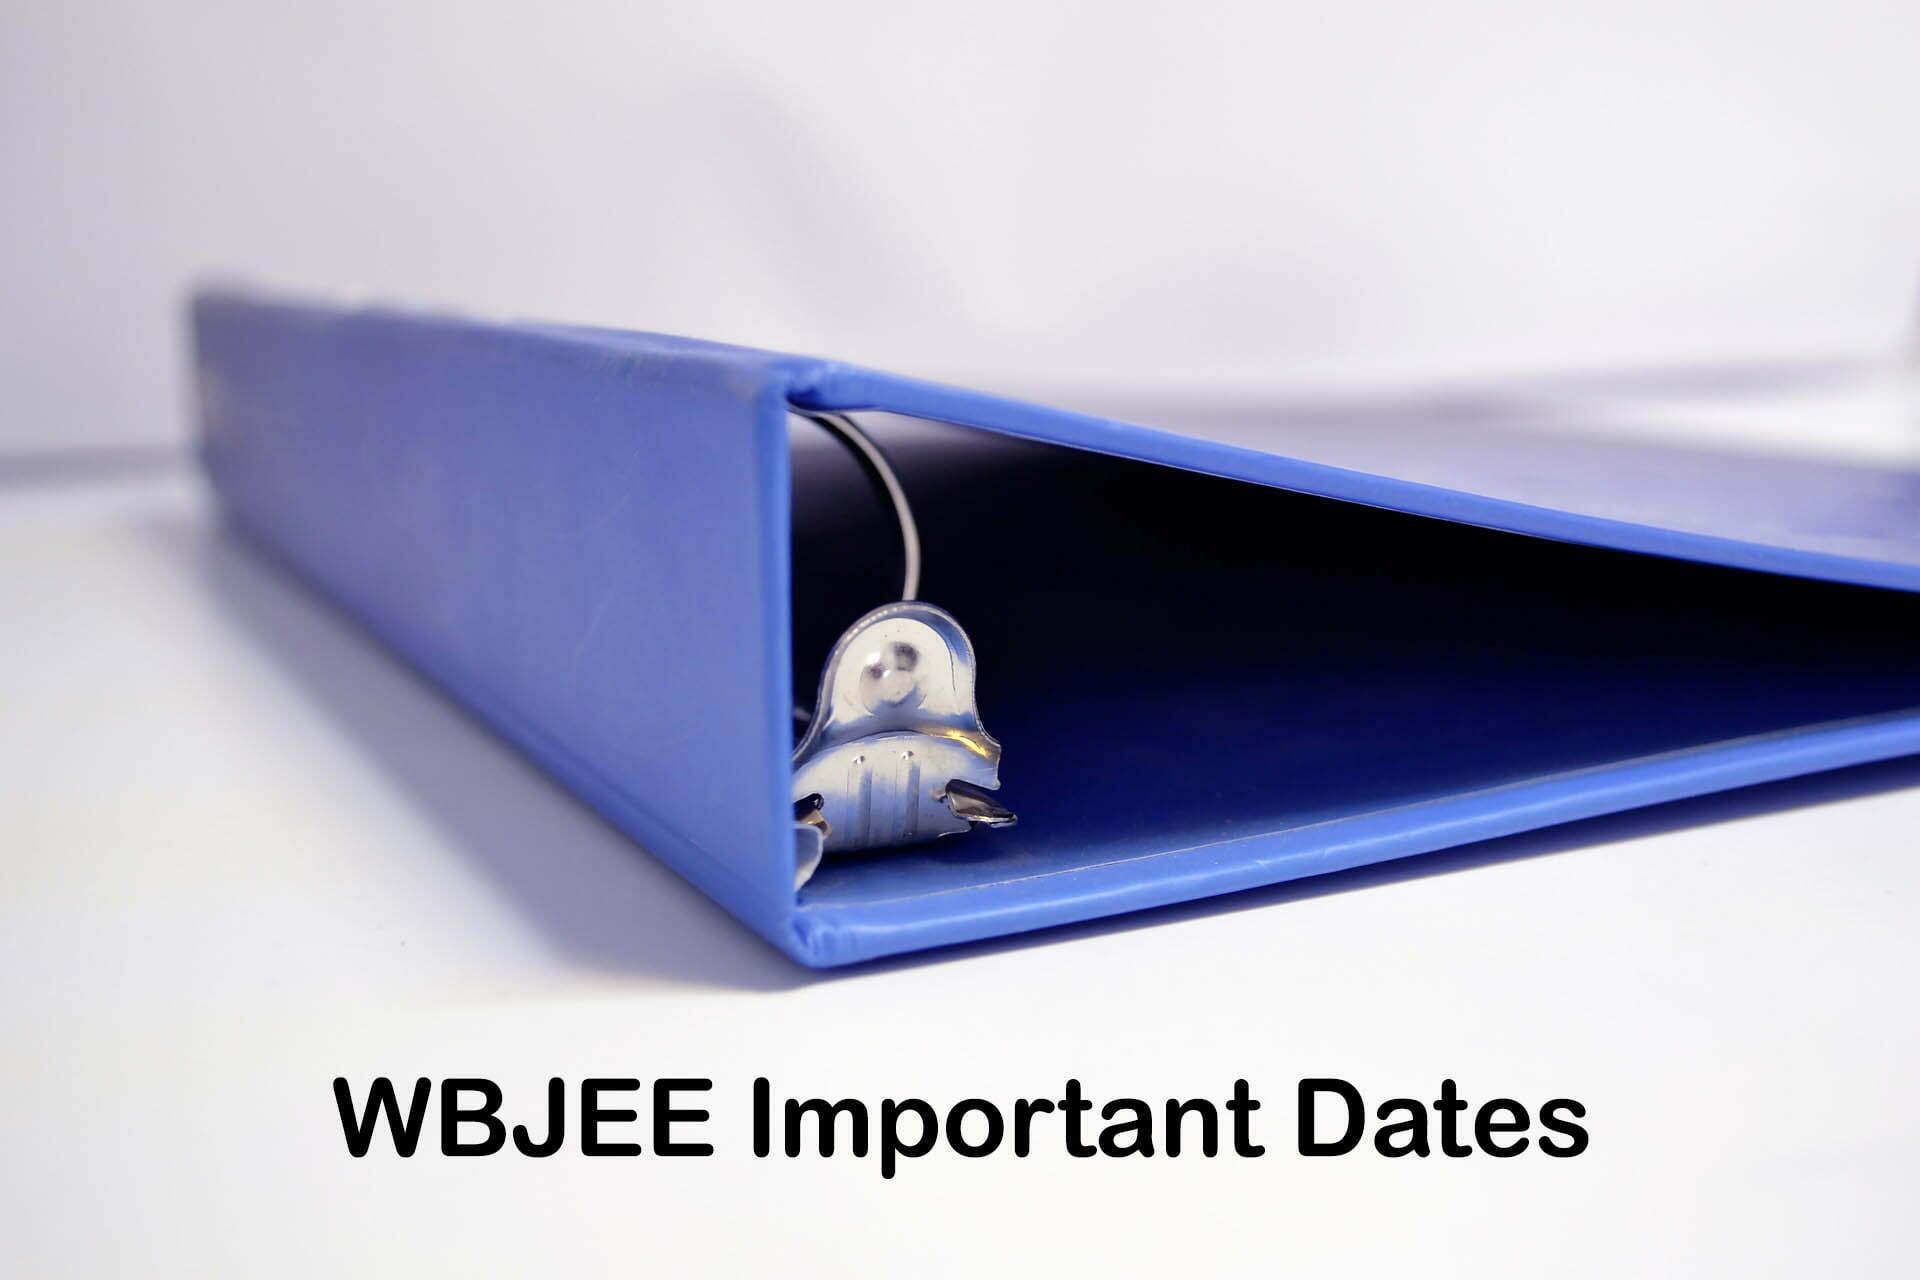 WBJEE Important Dates